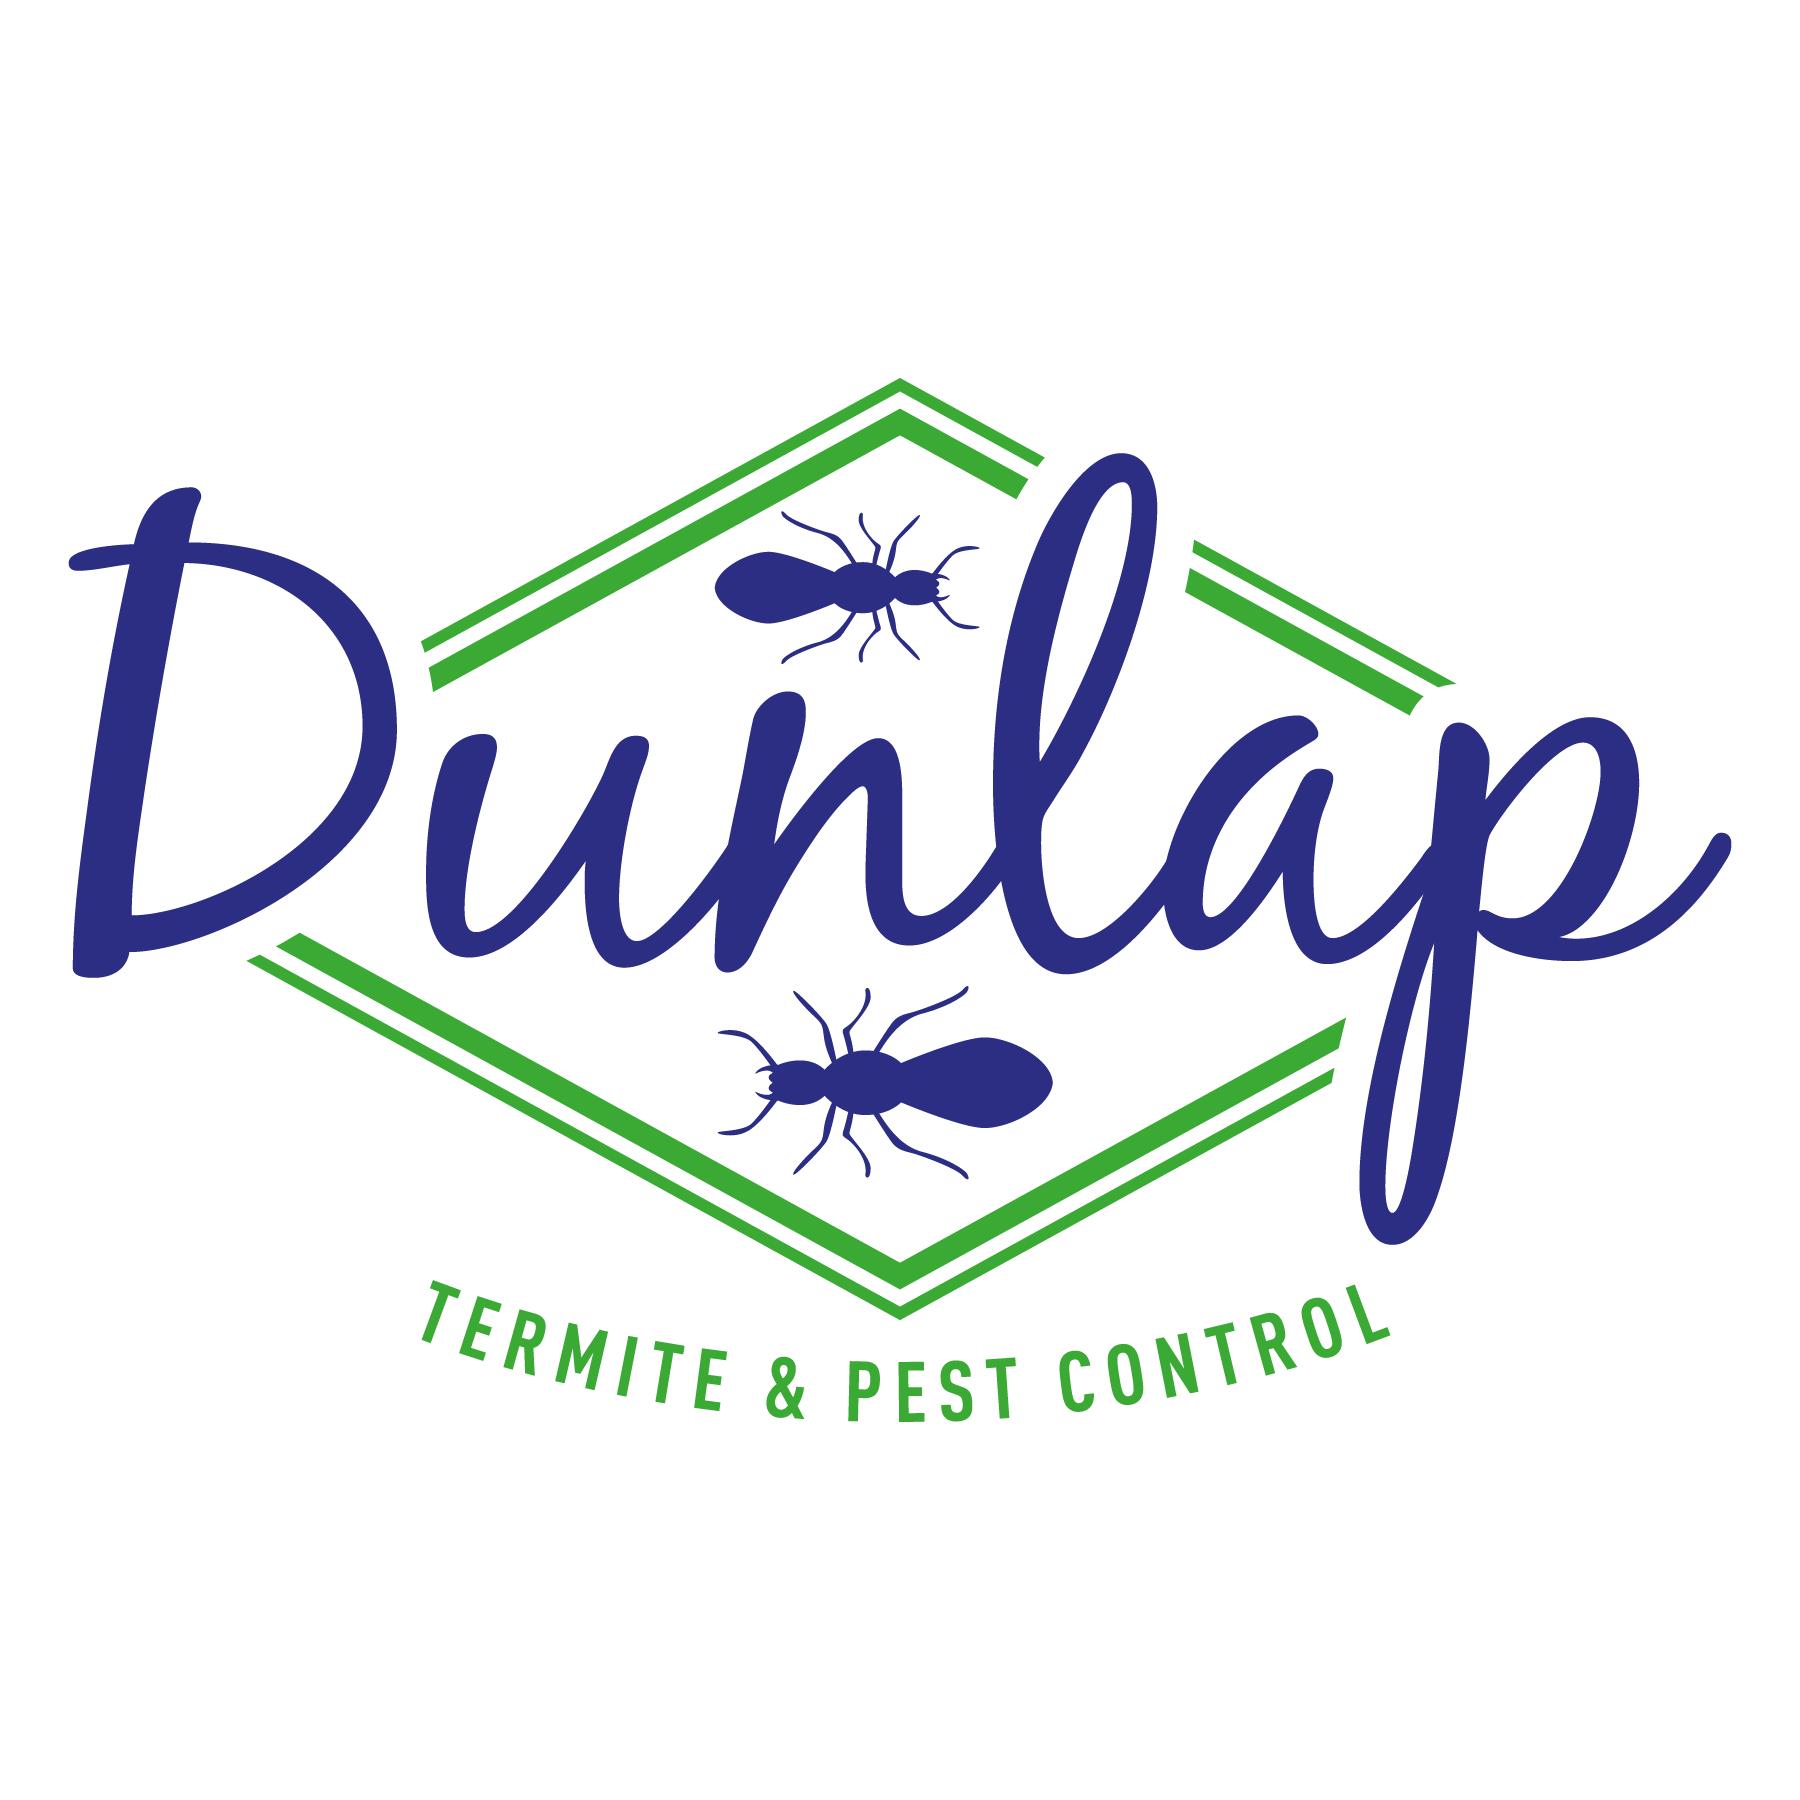 Dunlap Termite and Pest Control